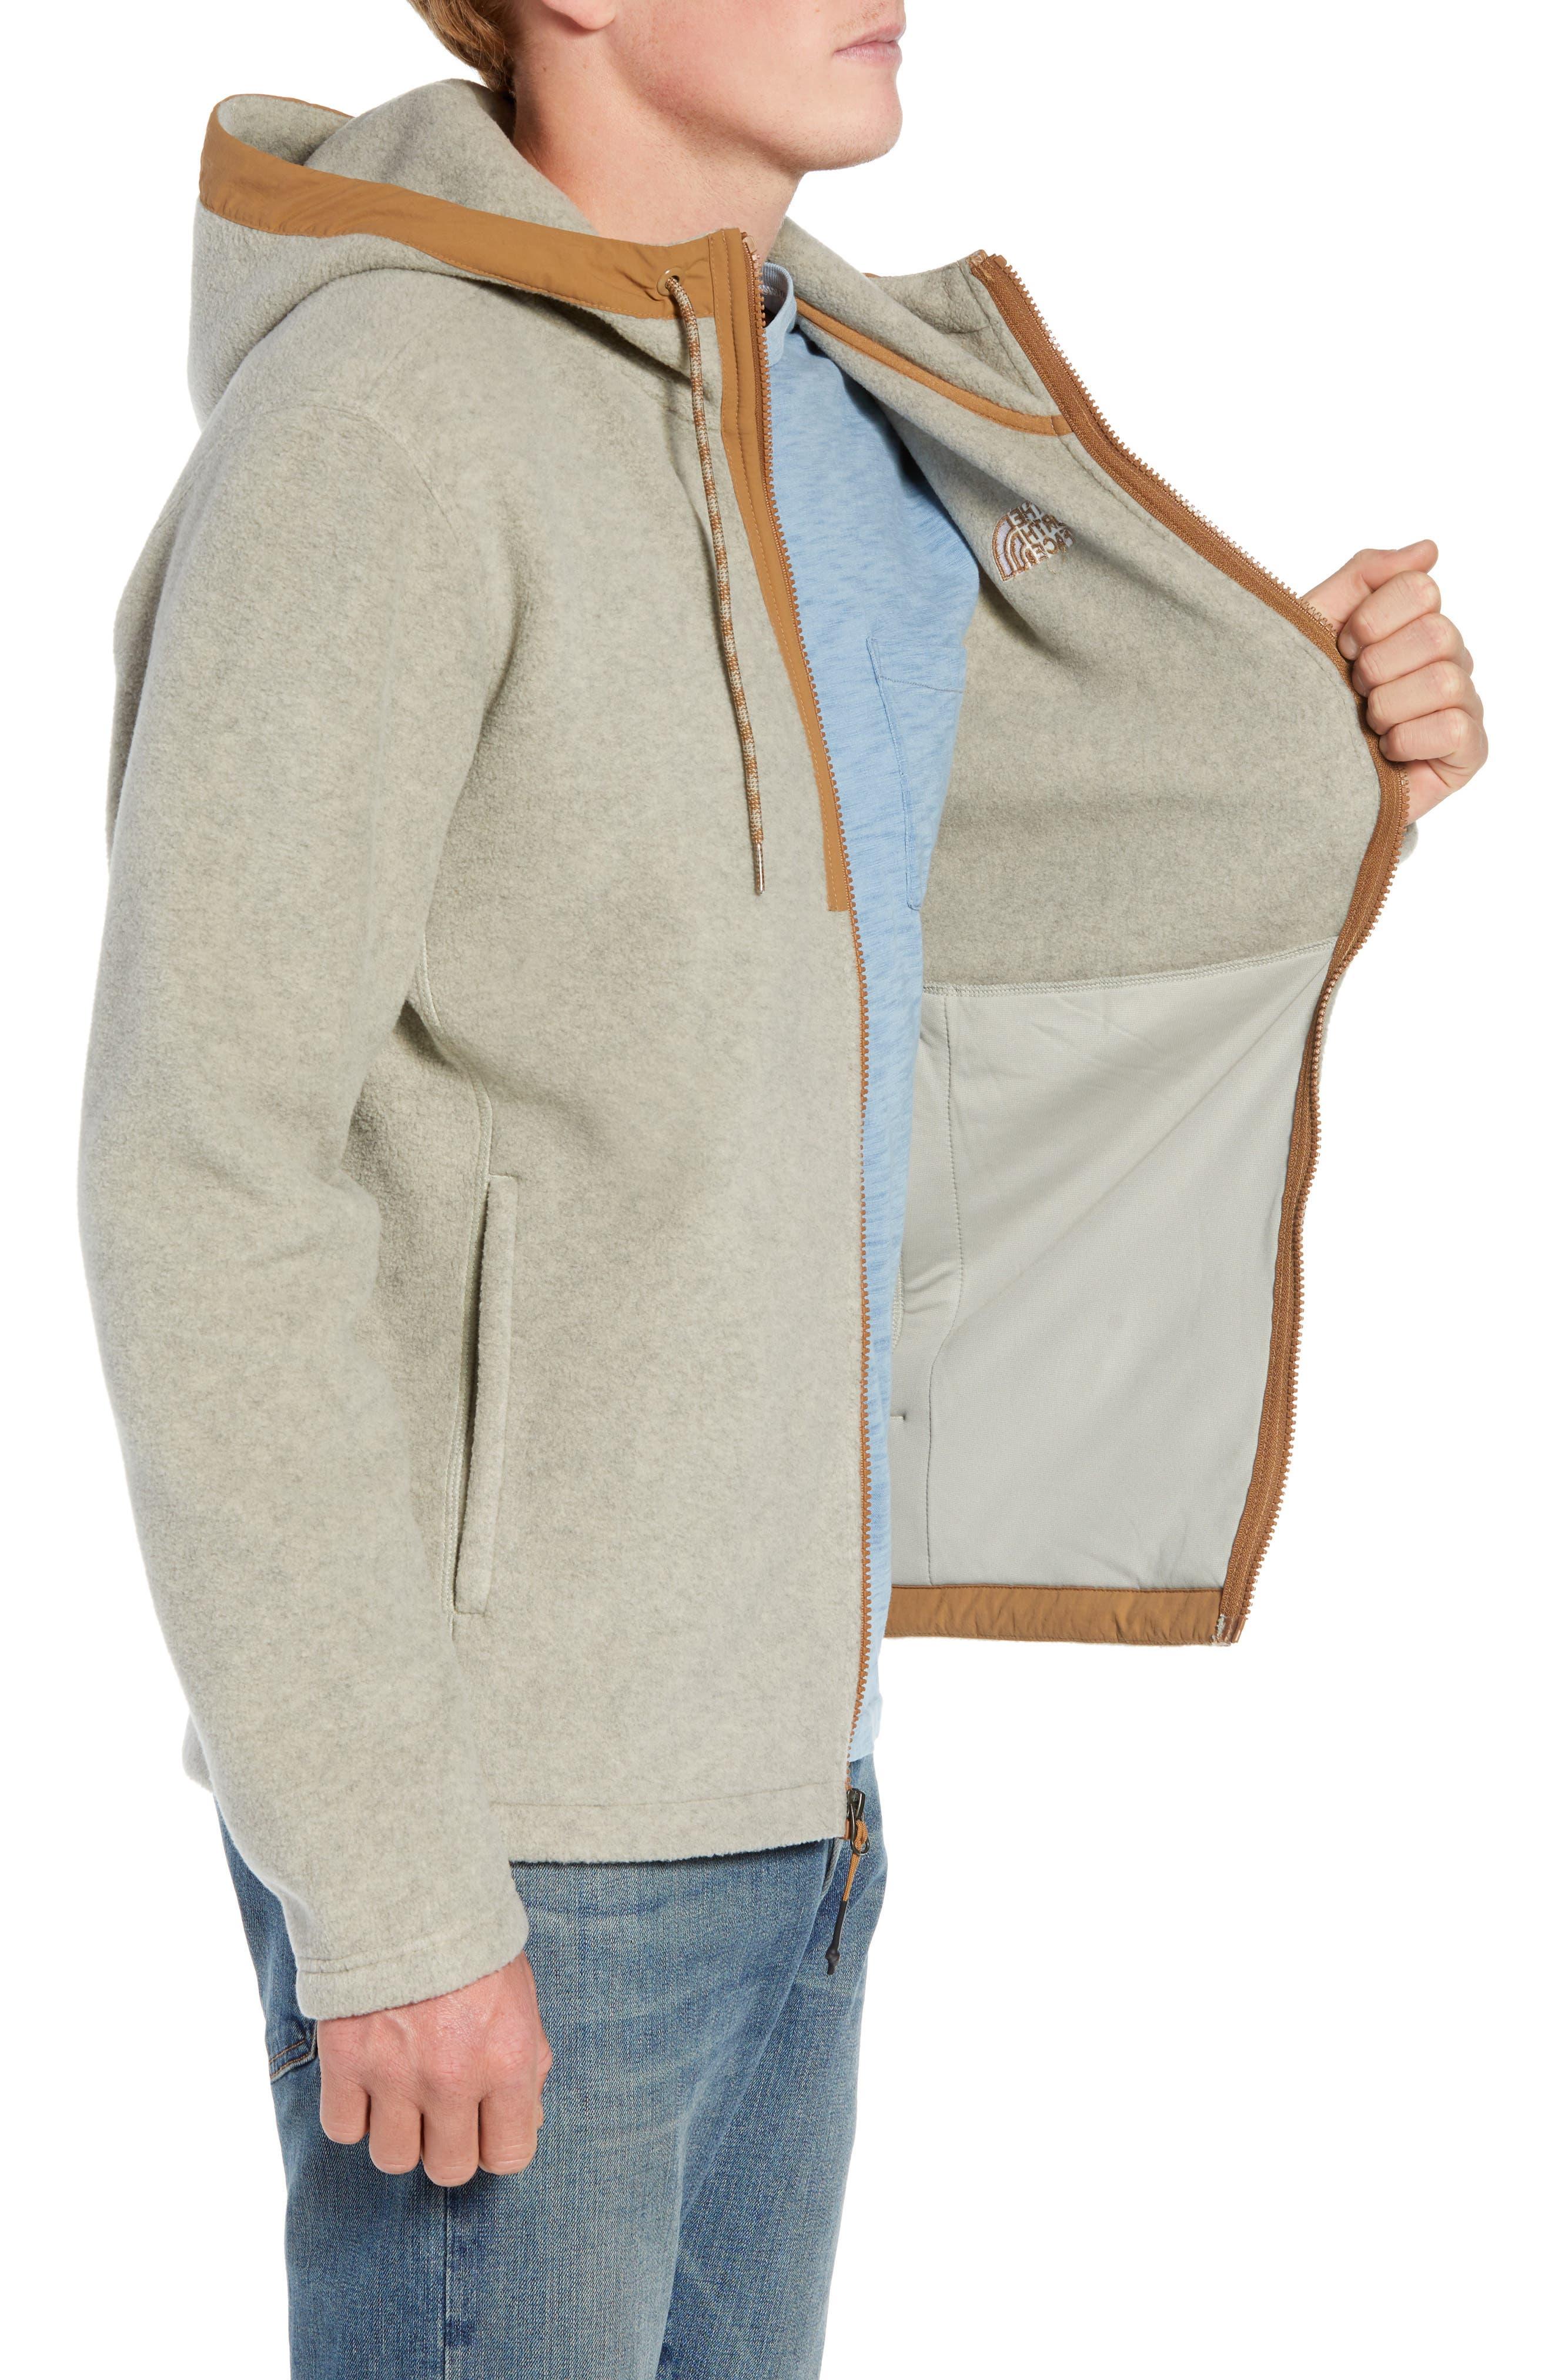 Pyrite Sweater Knit Fleece Hoodie,                             Alternate thumbnail 3, color,                             GRANITE BLUFF TAN HEATHER